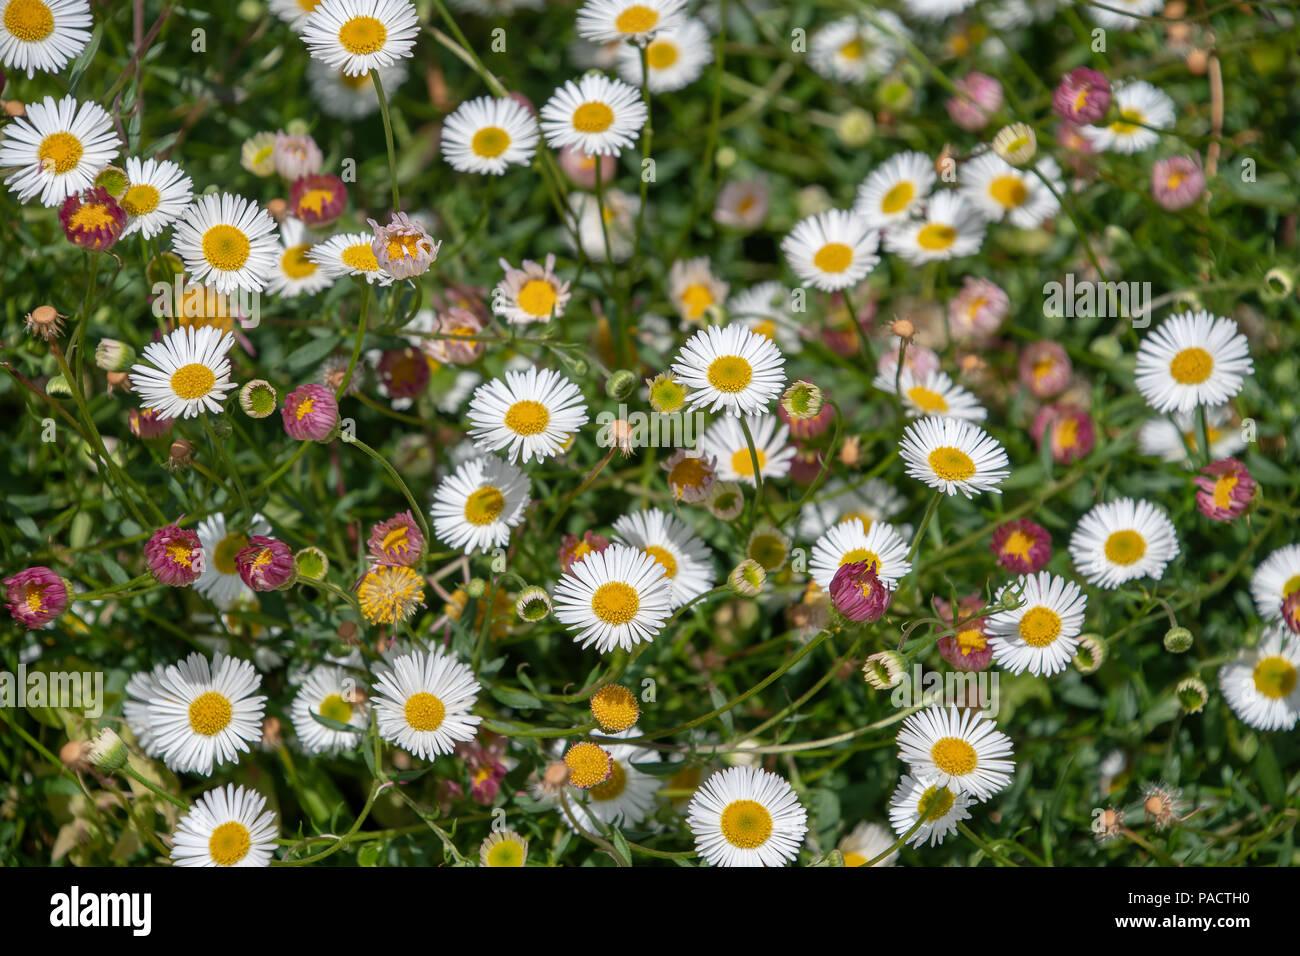 Erigeron Karvinskianus Has Daisy Like Flowers With Many Slender Rays